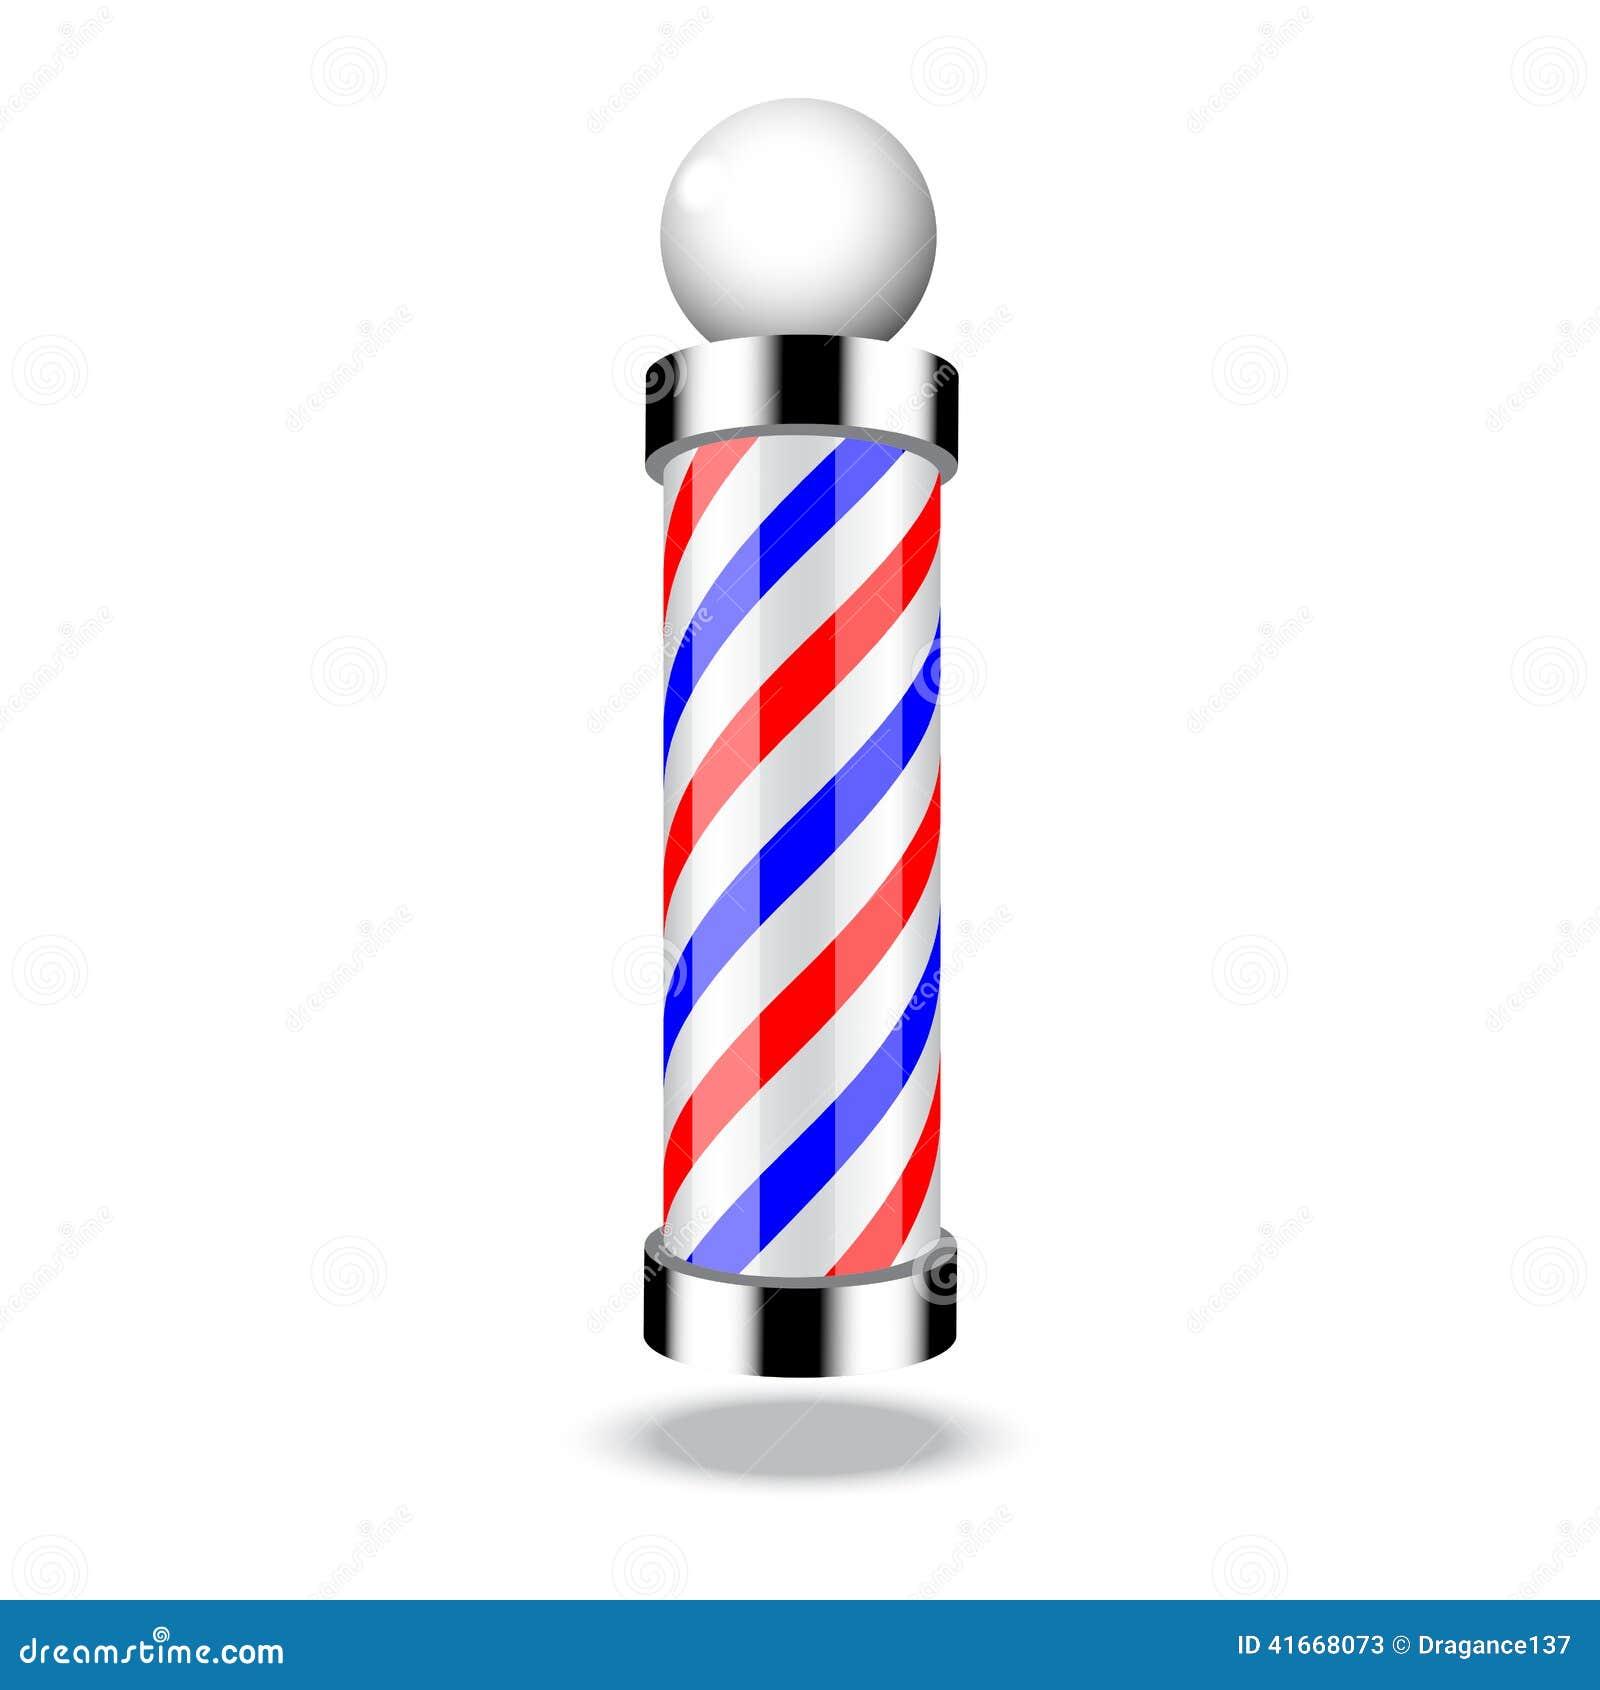 Barber Background : Barber Pole Background Classic Barber Shop Pole Stock